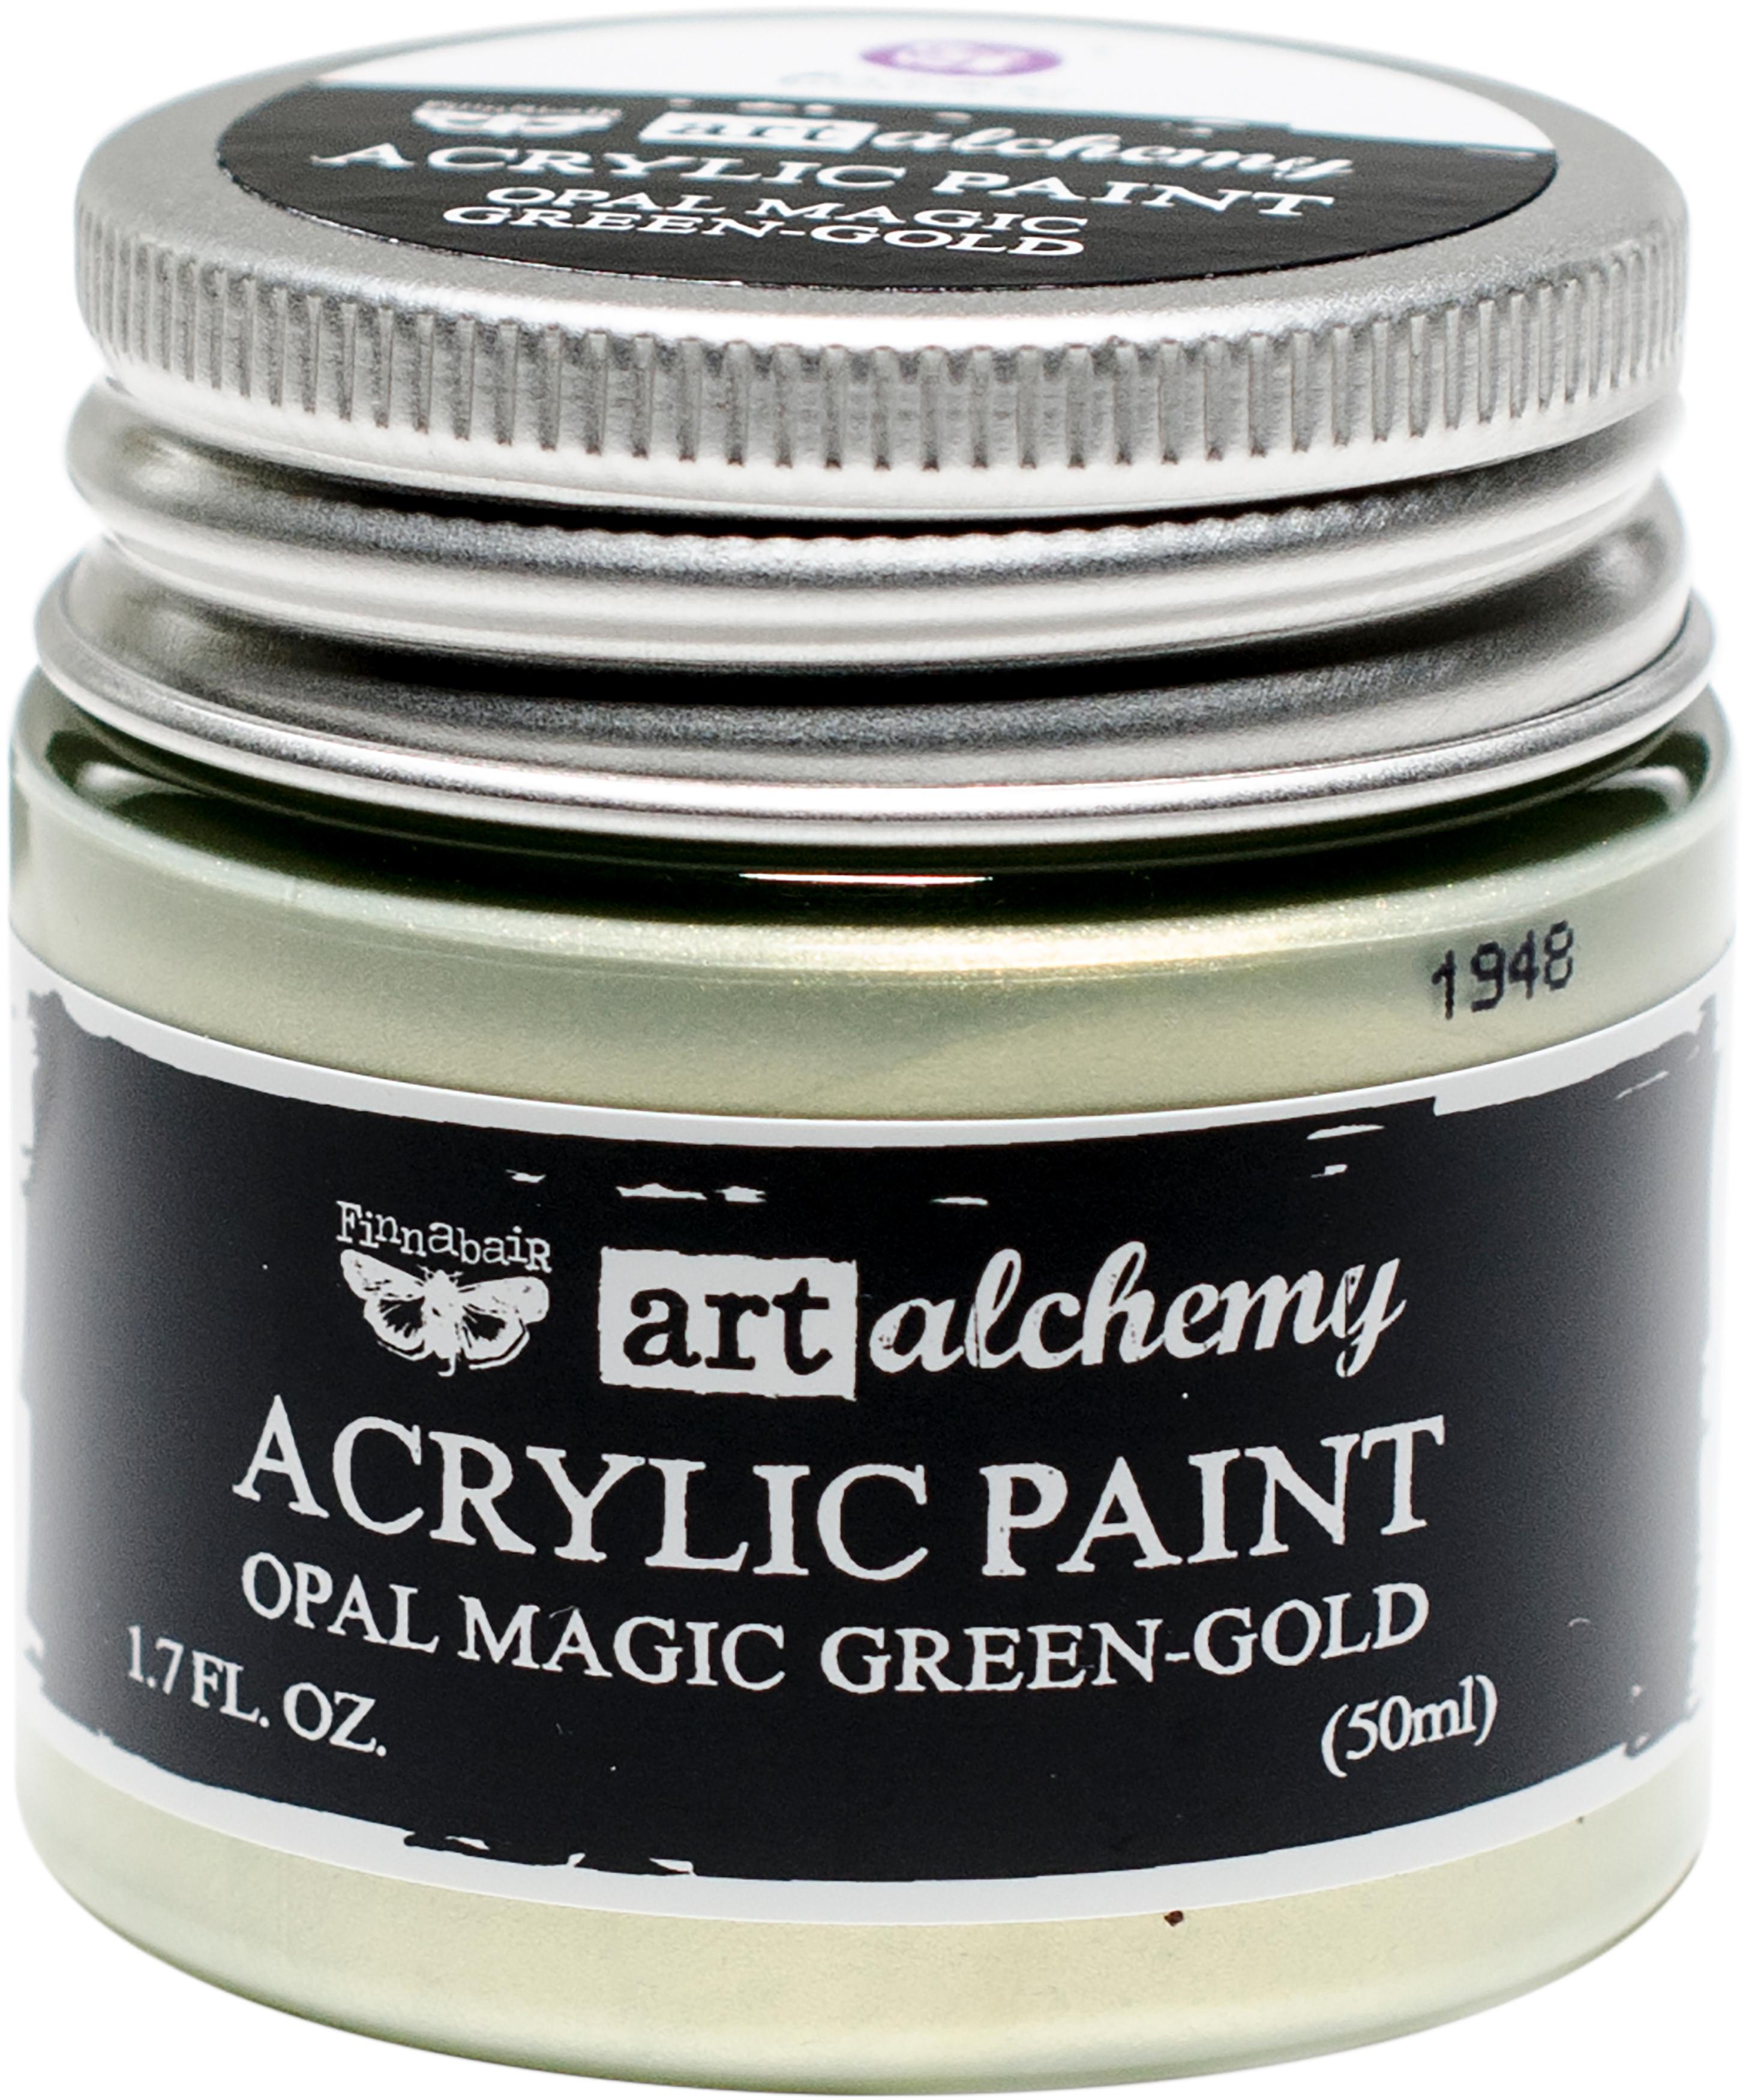 Finnabair Art Alchemy Opal Magic Acrylic Paint 1.7 Fl Oz-Opal Magic Green/Gold